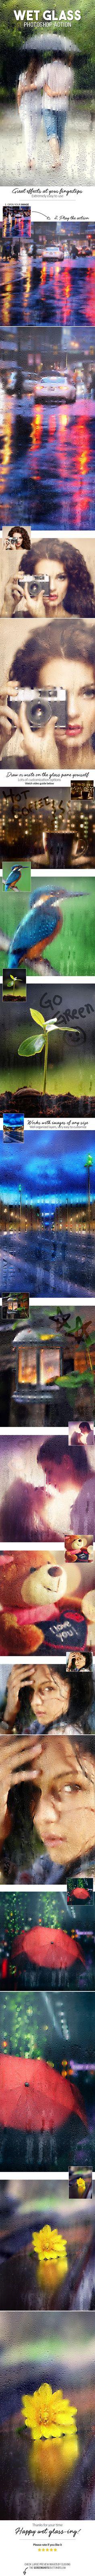 Wet Glass Photoshop Action. Download here: https://graphicriver.net/item/wet-glass-photoshop-action/17358079?ref=ksioks